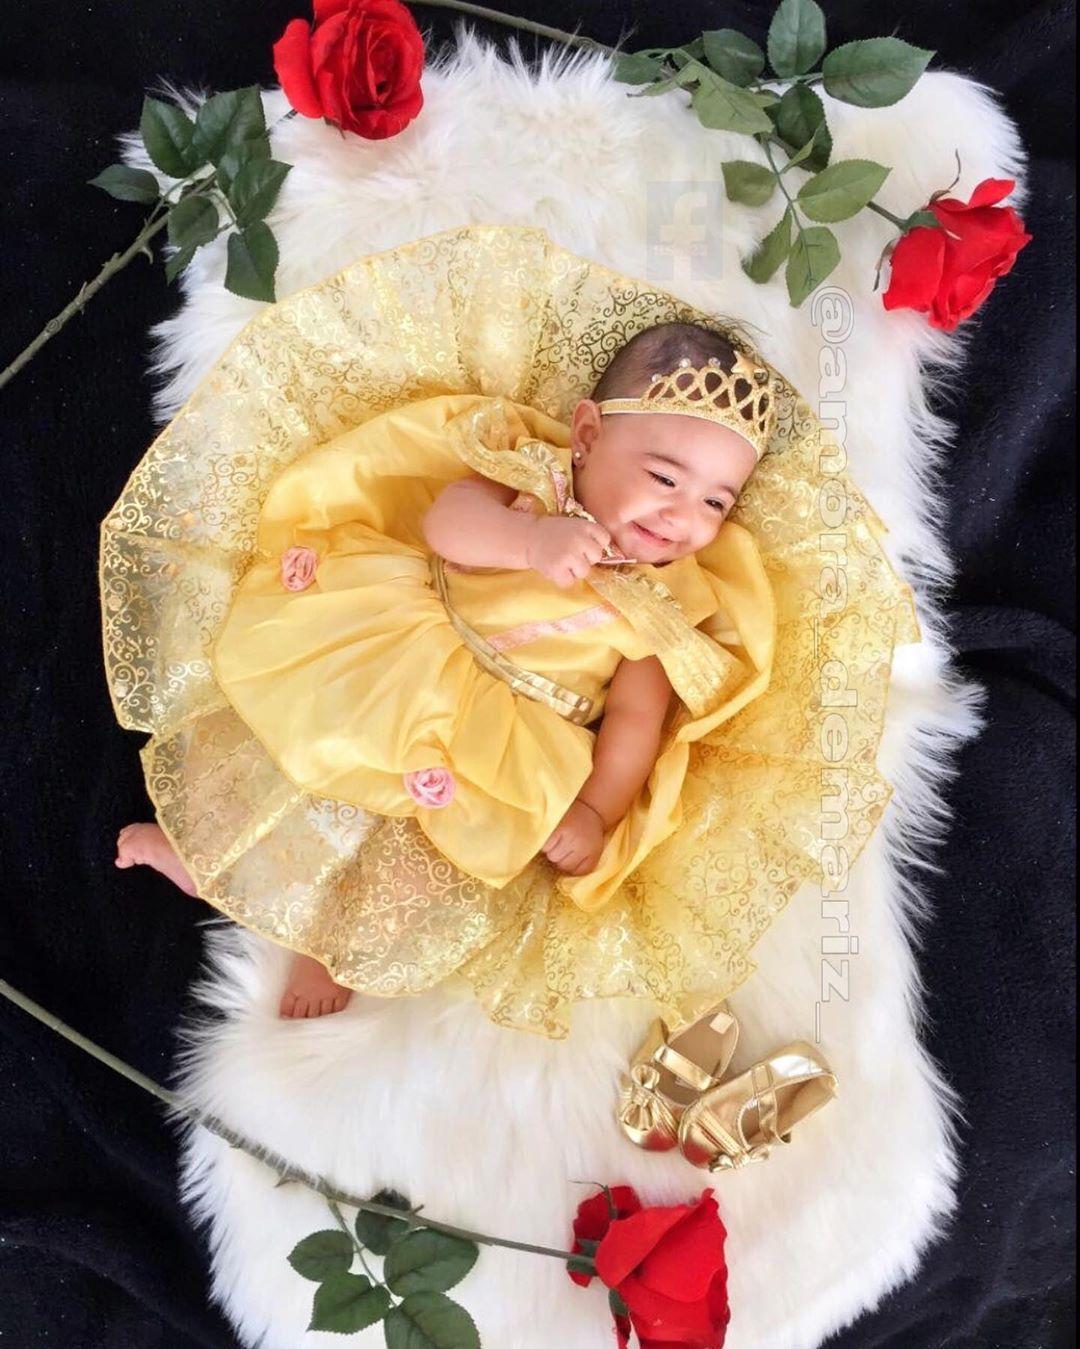 My baby Amora❤️👑🌹 #babyprincess #princess #DisneyBaby #love #amor #happybaby #gold #dress #roses #beatiful #prettybaby #beautifulbaby #mylittleme #disney #memories #disneyphotography #disneyhalloween #disneydream #disneyig #disneyart #disneystore #disneystyle #disneymagic #beautyandthebeast #belle #babyfever #babymodel #babyactress #babyamo